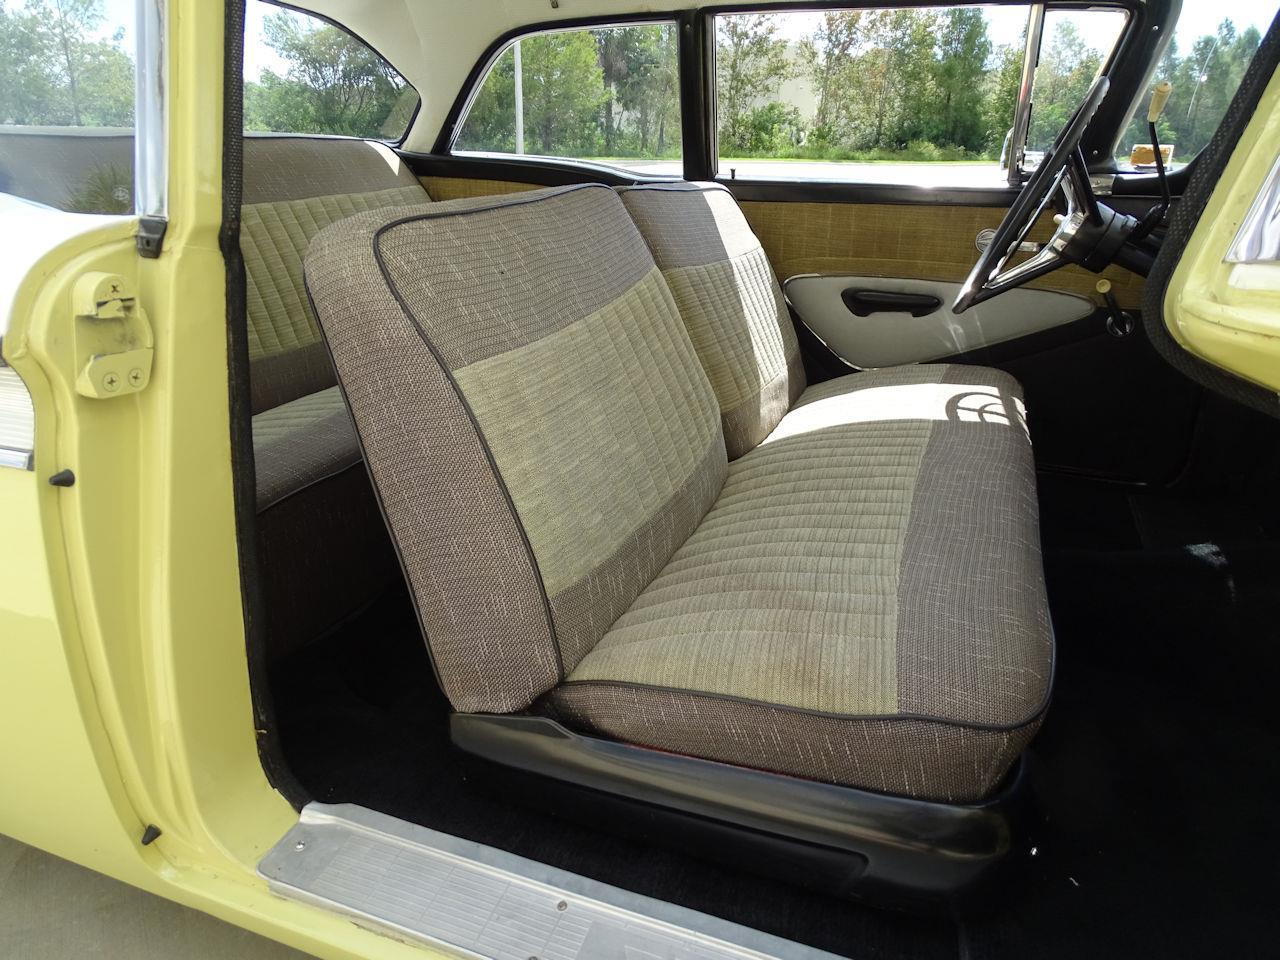 1959 Ford Fairlane 500 (CC-1410509) for sale in O'Fallon, Illinois